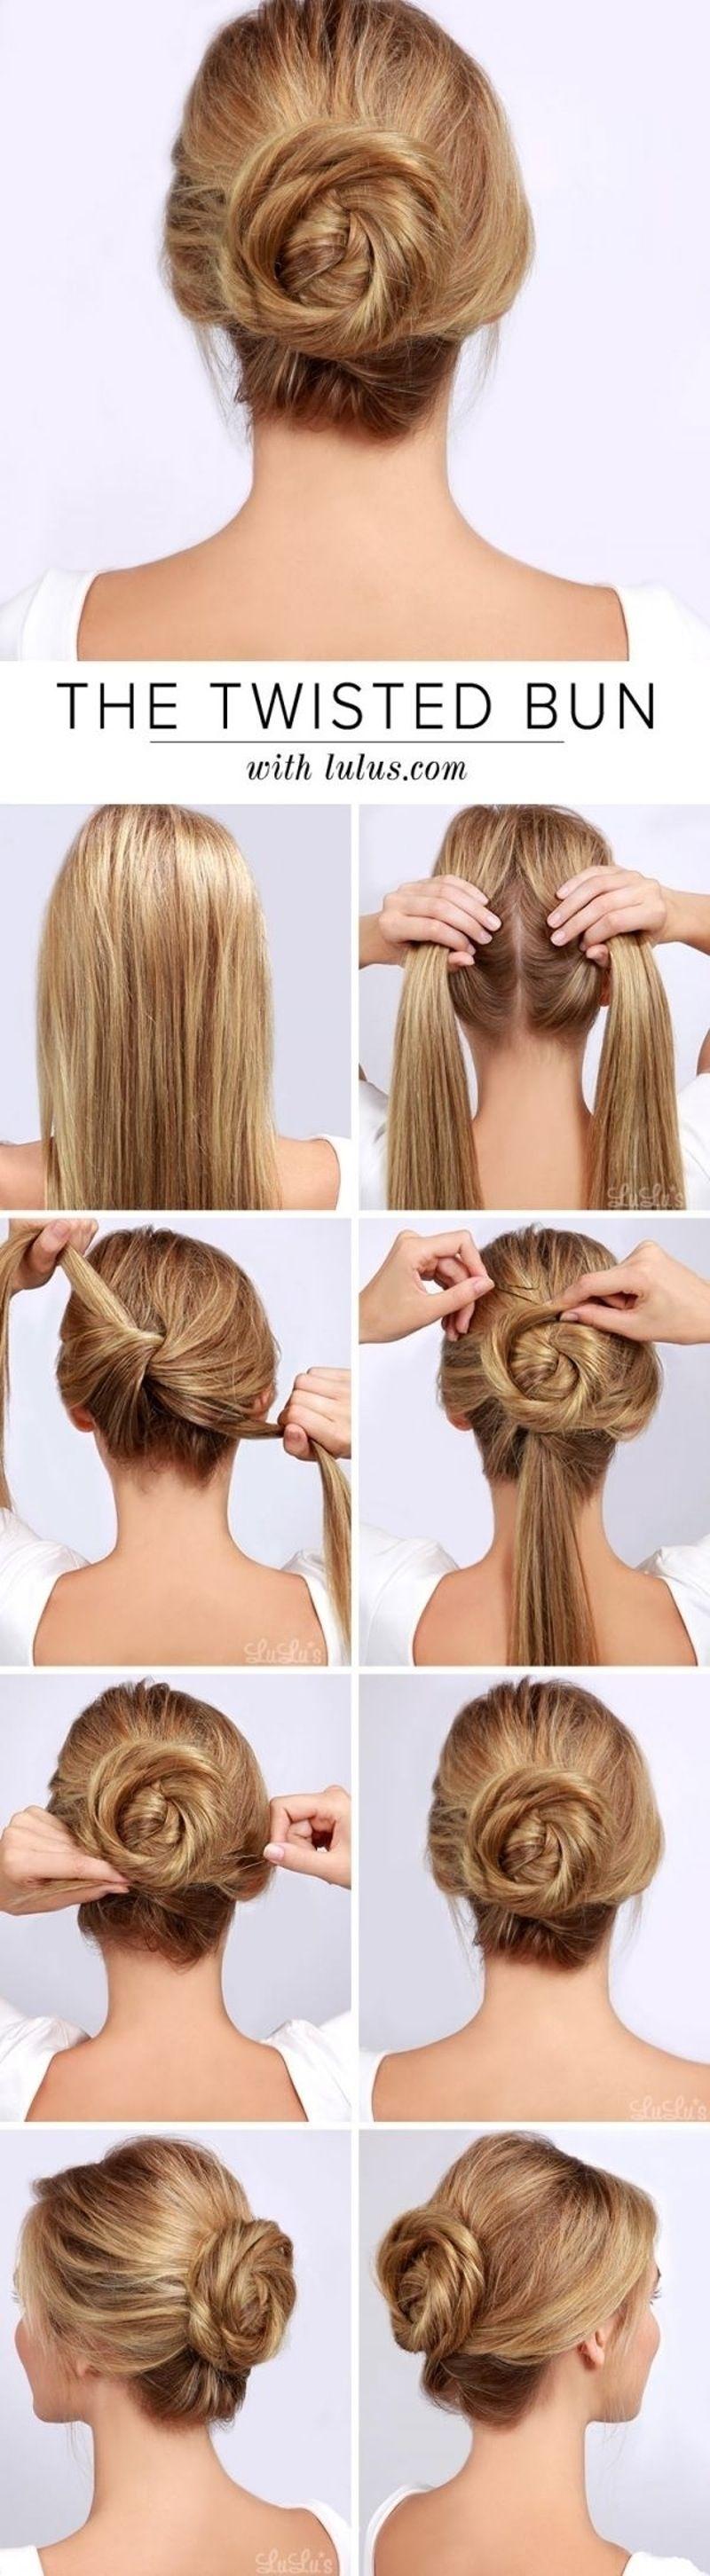 4. #Twisted Bun - 16 Gorgeous Hair #Styles for Lazy Girls like Me ... → Hair #Twist